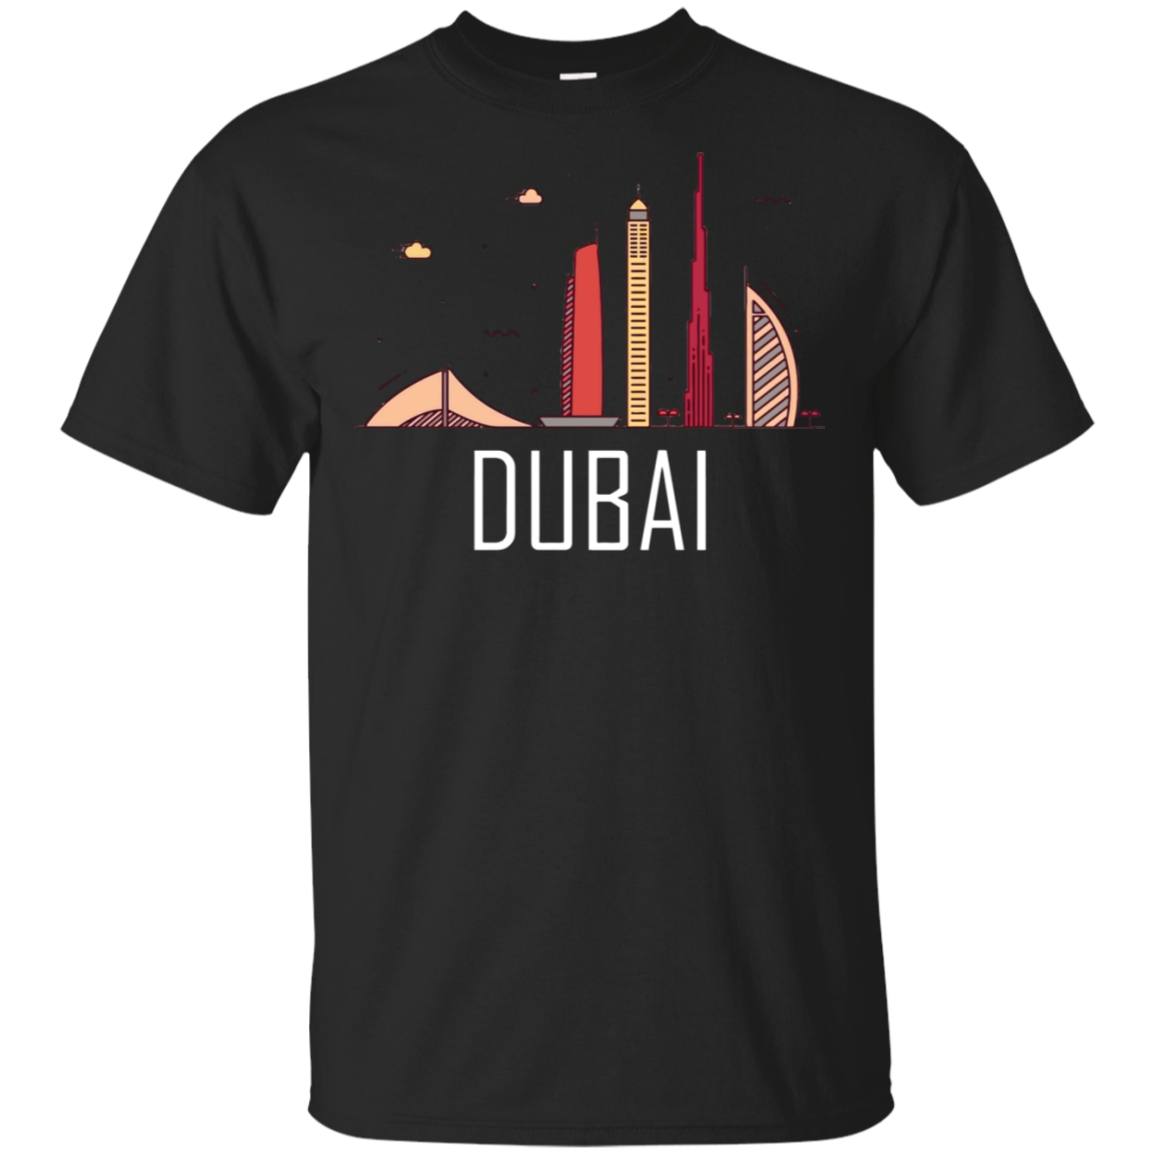 Burj Khalifa Burj Al Arab Skyline Skyscraper Dubai T-Shirt Black-Navy Men-Women